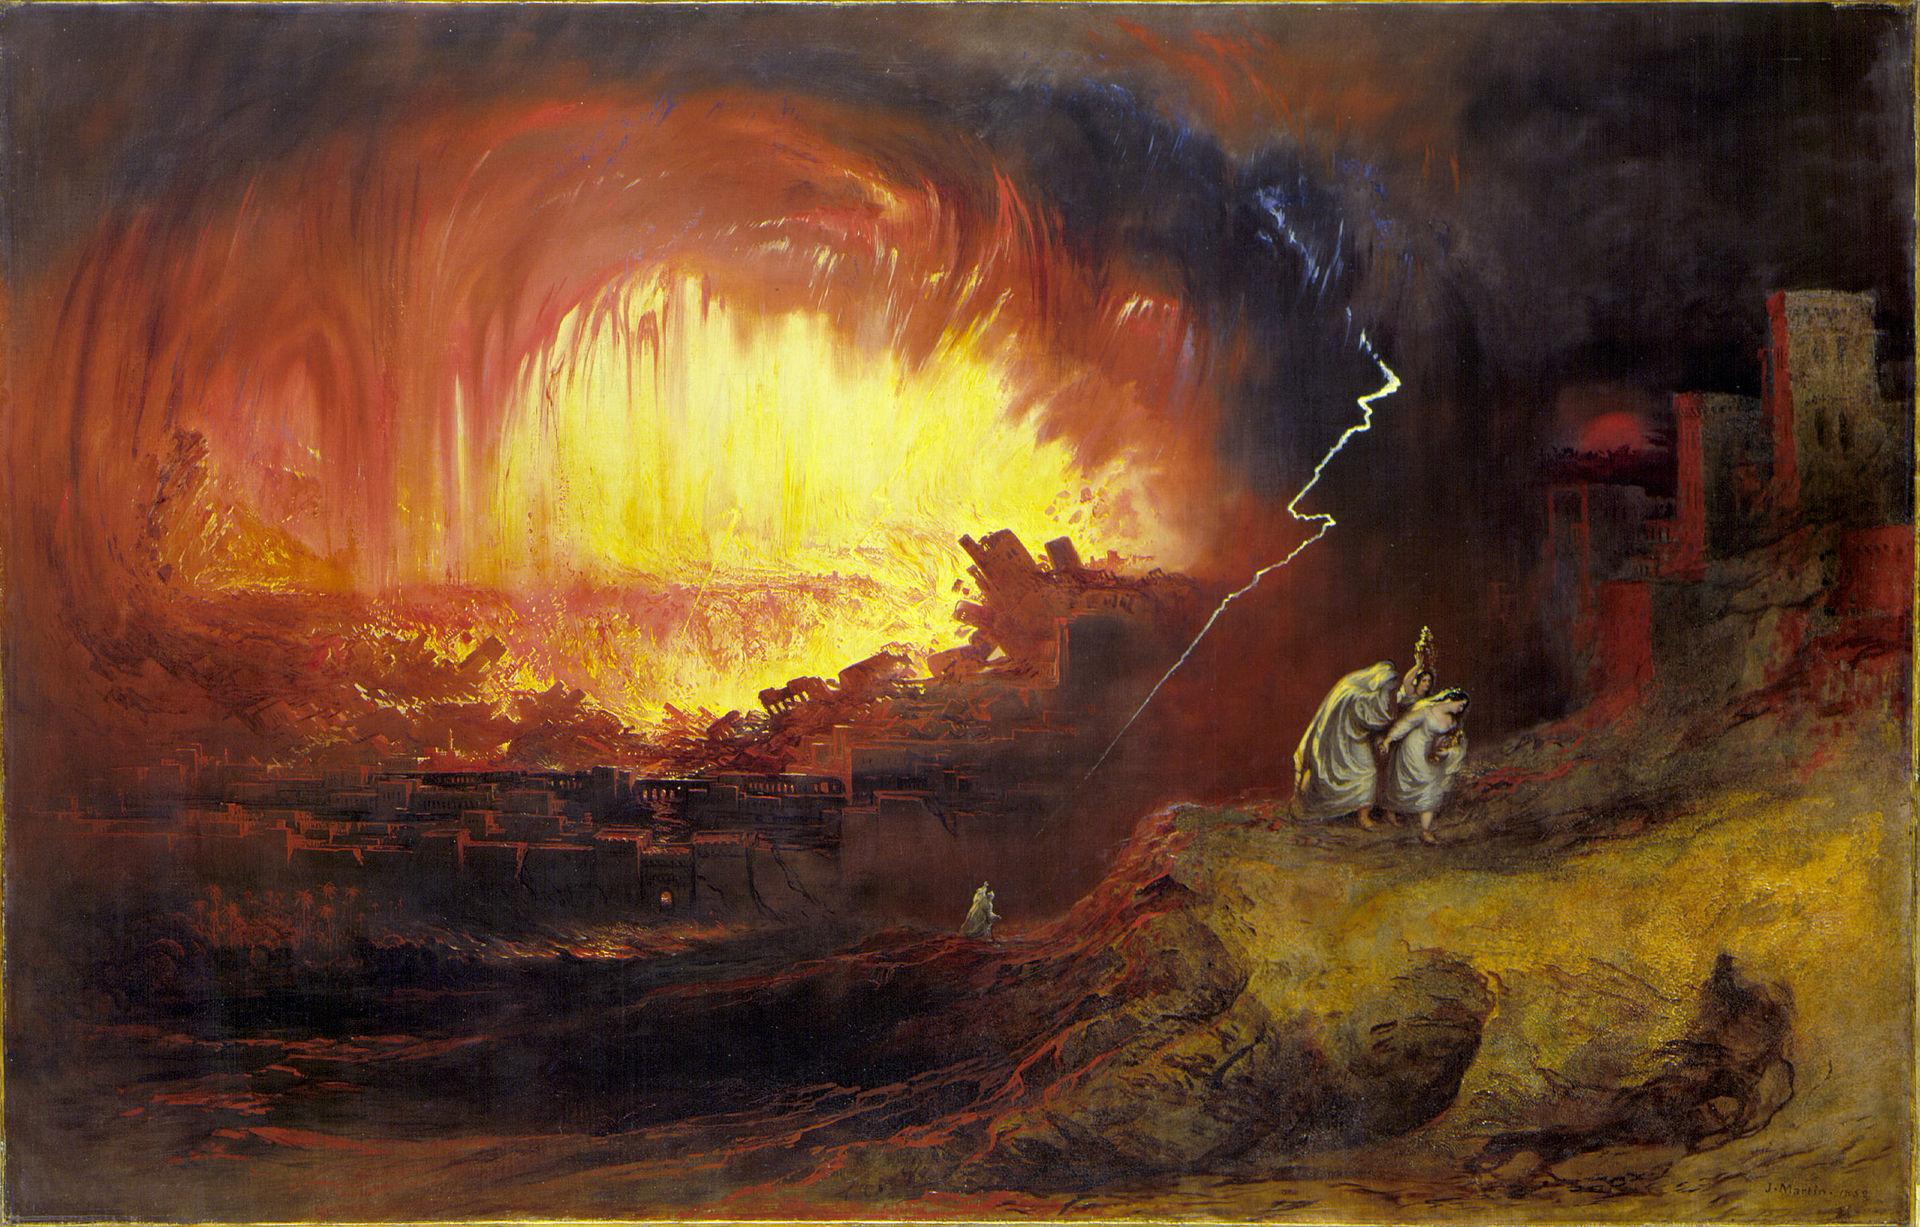 """The Destruction of Sodom and Gomorrah,"" John Martin, 1852"